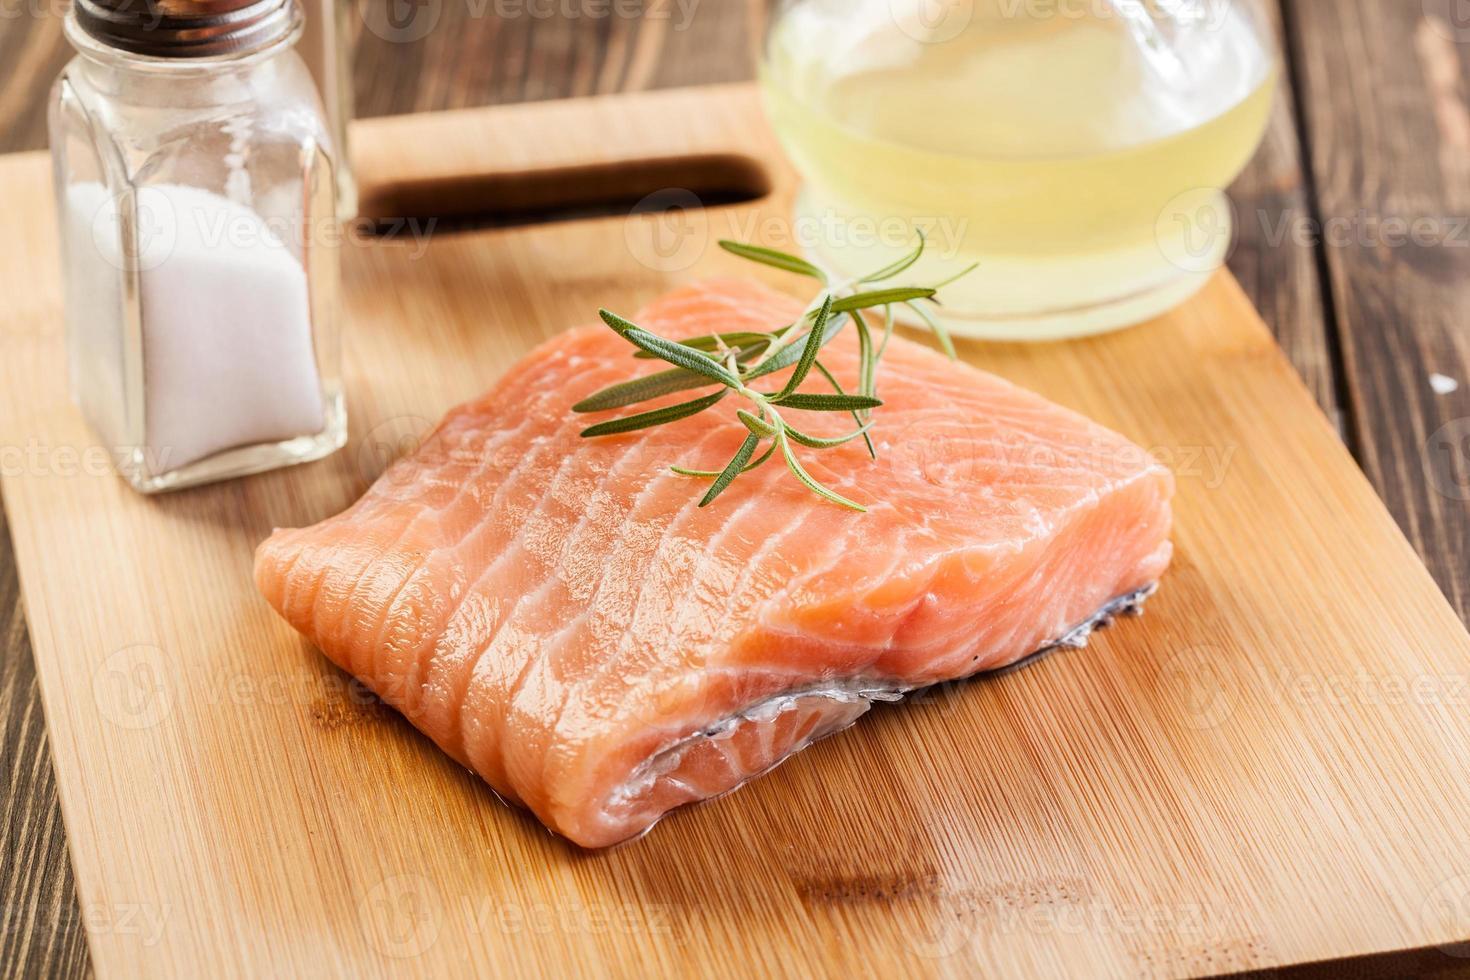 Raw salmon filet on wooden cutting board photo